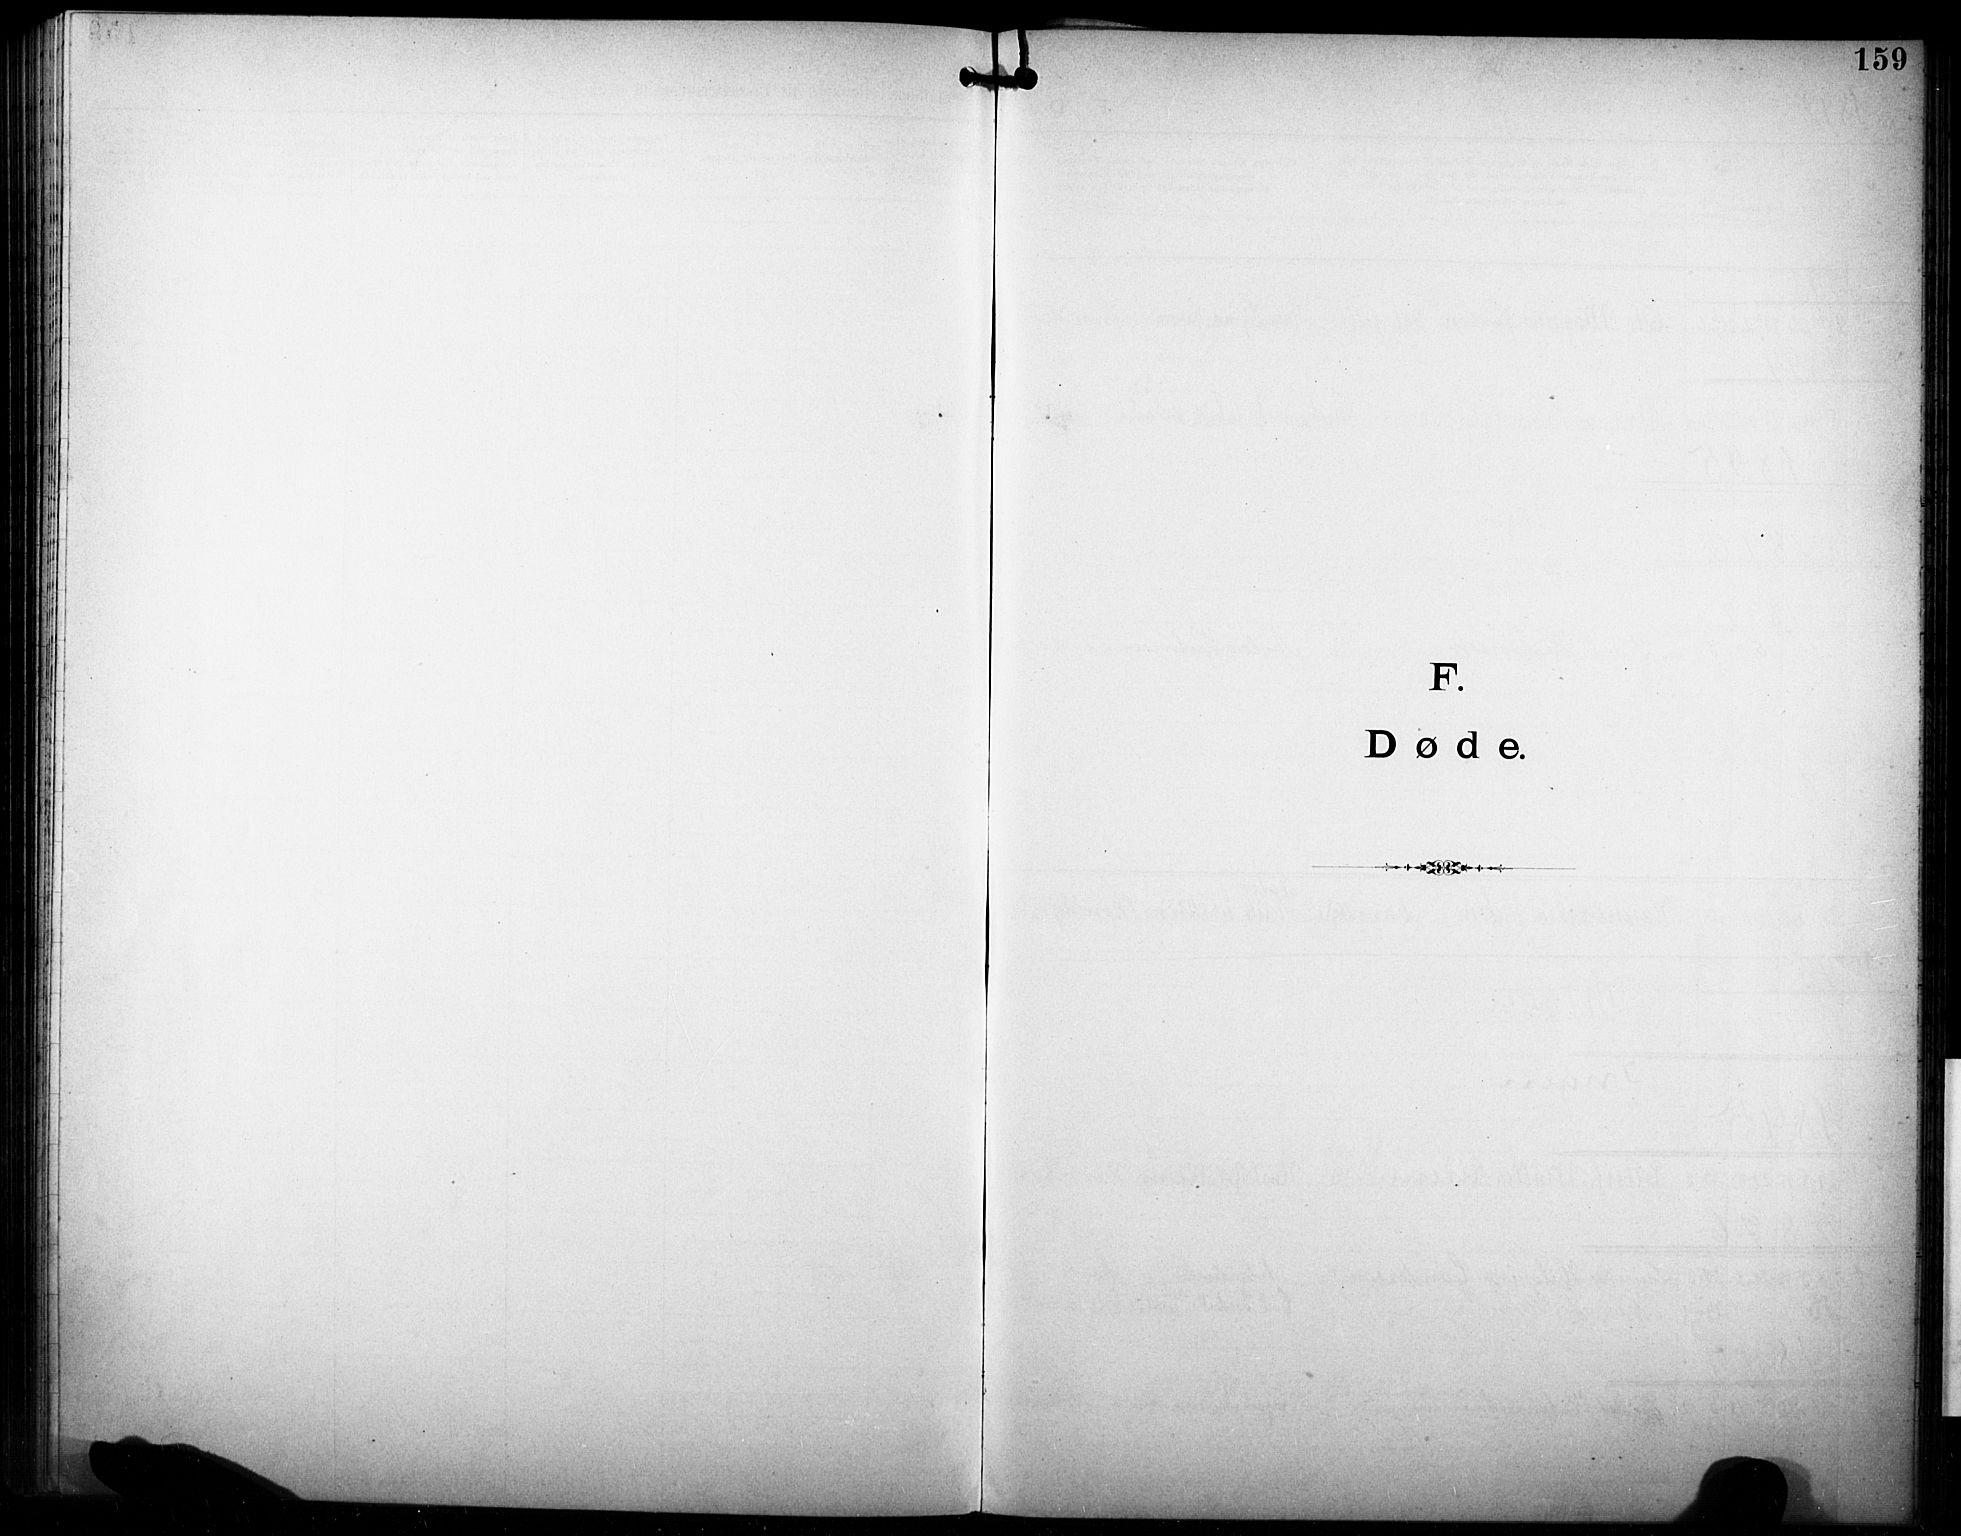 SAKO, Den katolsk-apostoliske menighet i Larvik, F/Fa/L0001: Dissenterprotokoll nr. 1, 1892-1933, s. 159